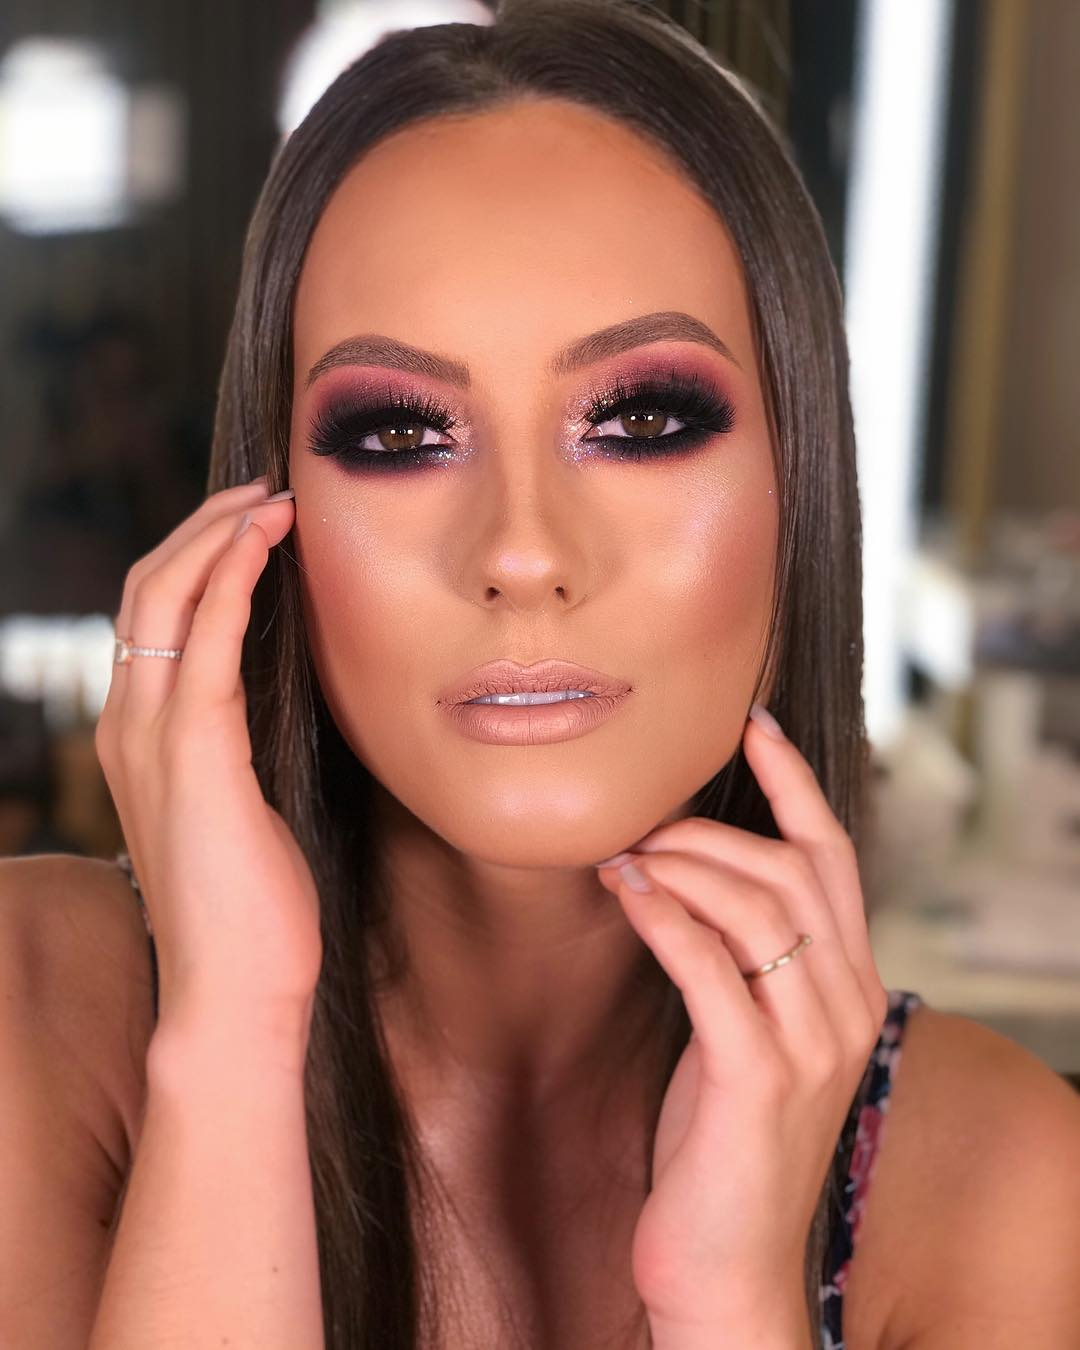 cristine boff sartor, segunda finalista de miss latinoamerica 2019. - Página 4 49858114